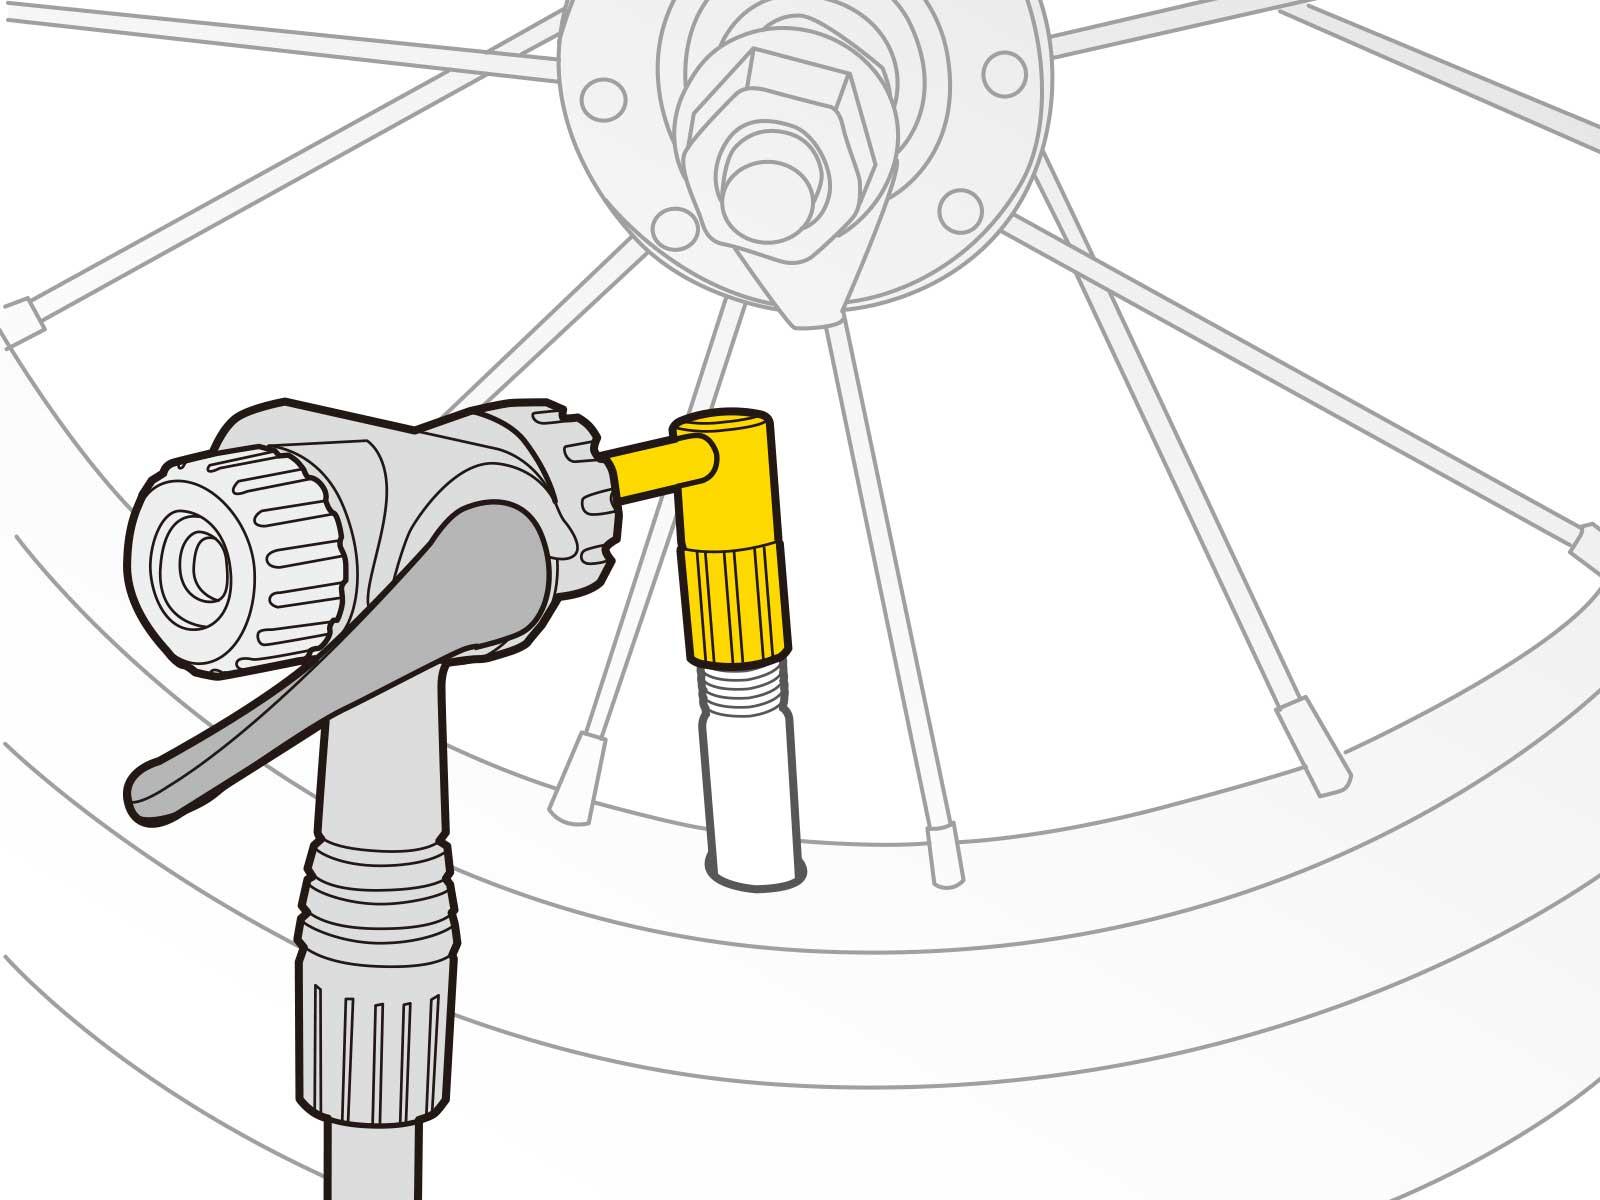 Topeak Tsv-01 Pressure Right Schrader Valve Adaptor